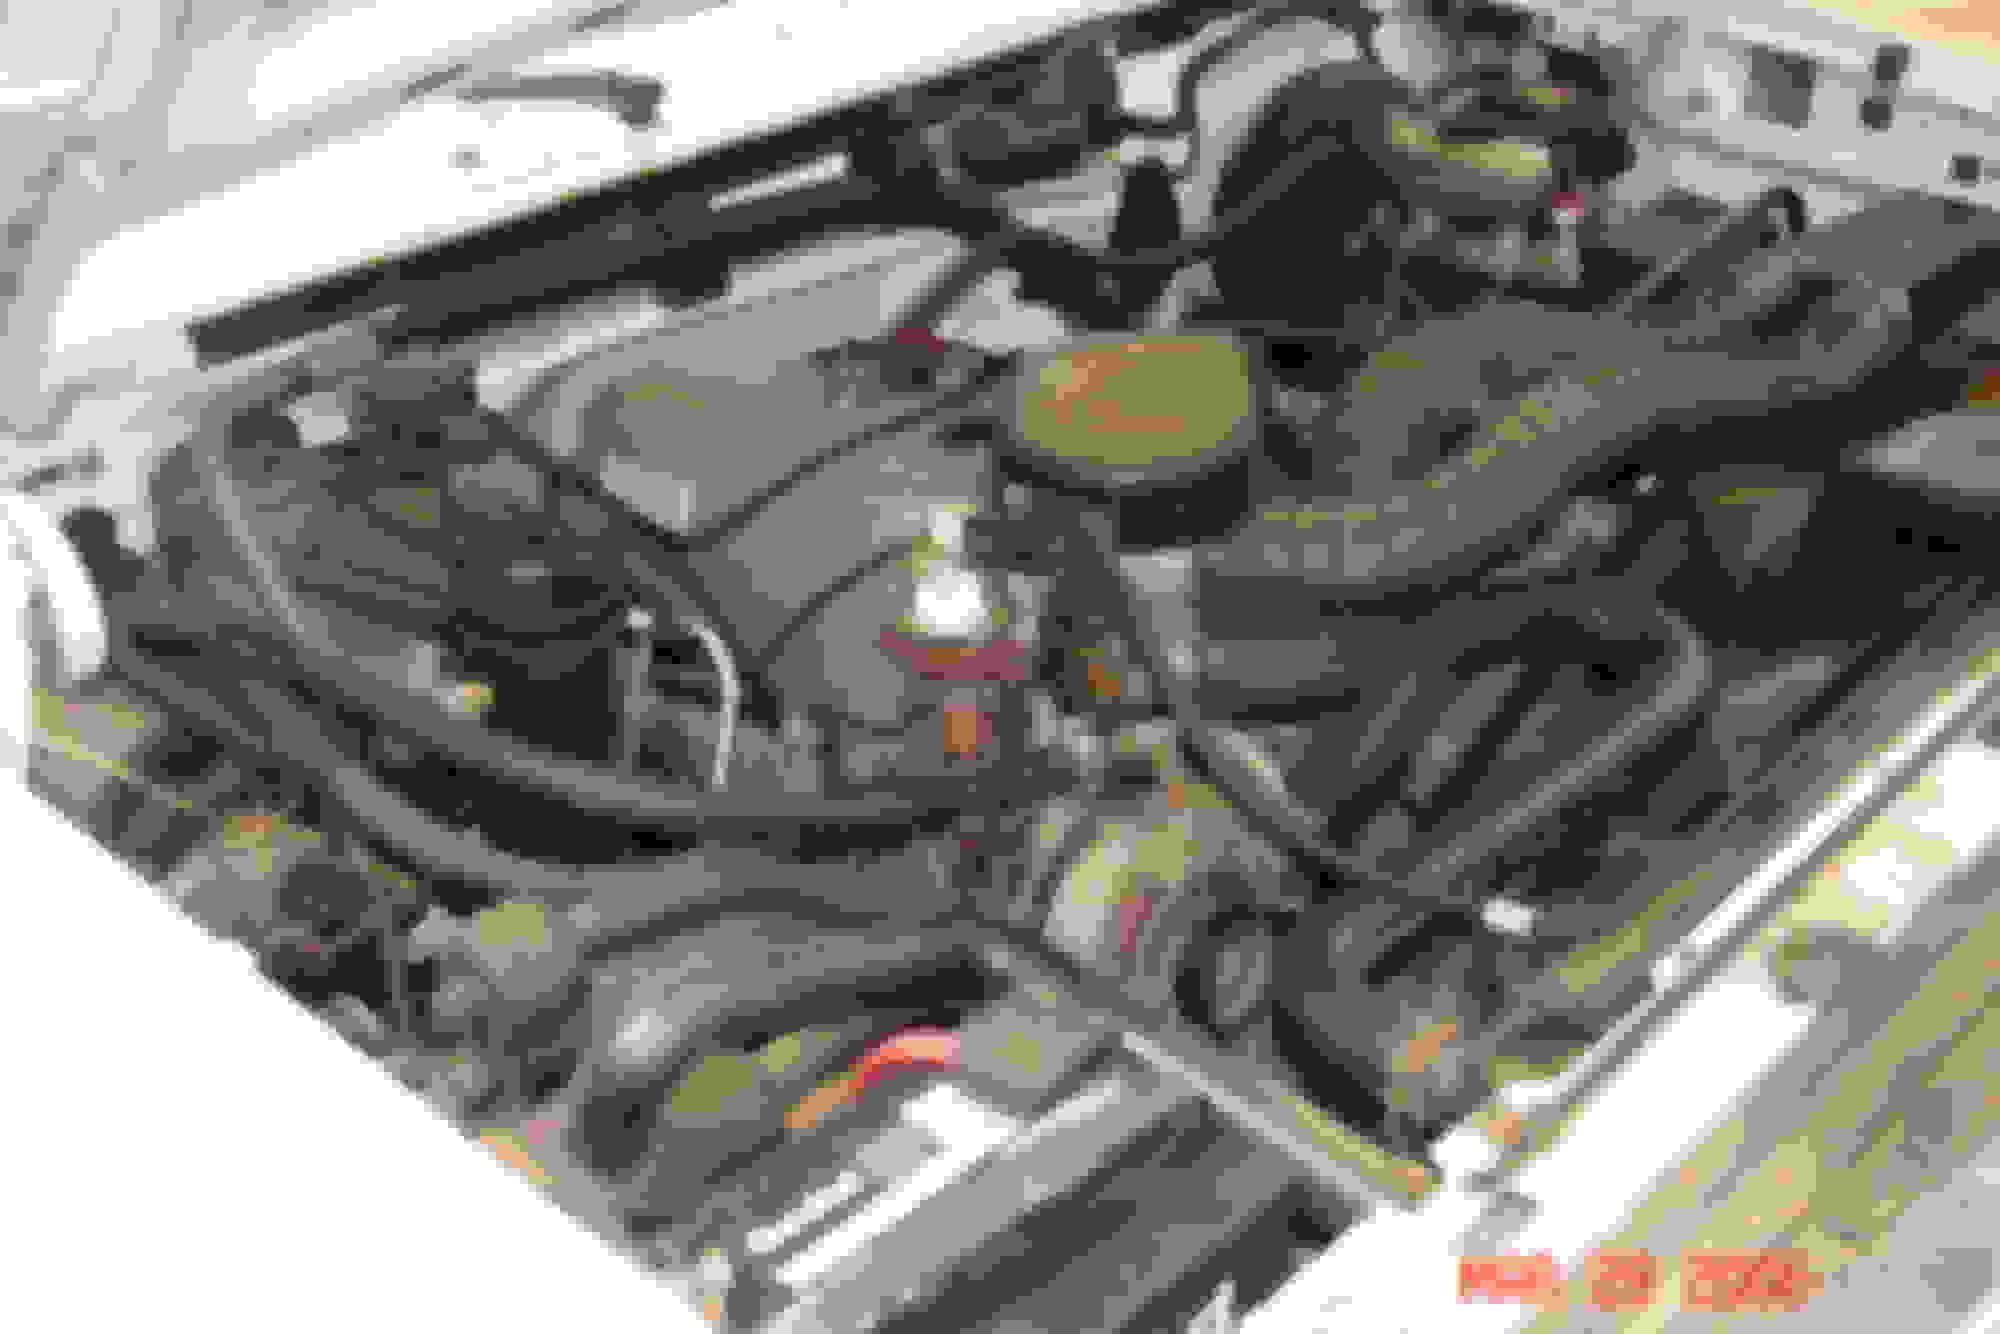 56919 92 F250 Engine Diagram | Digital Resources on